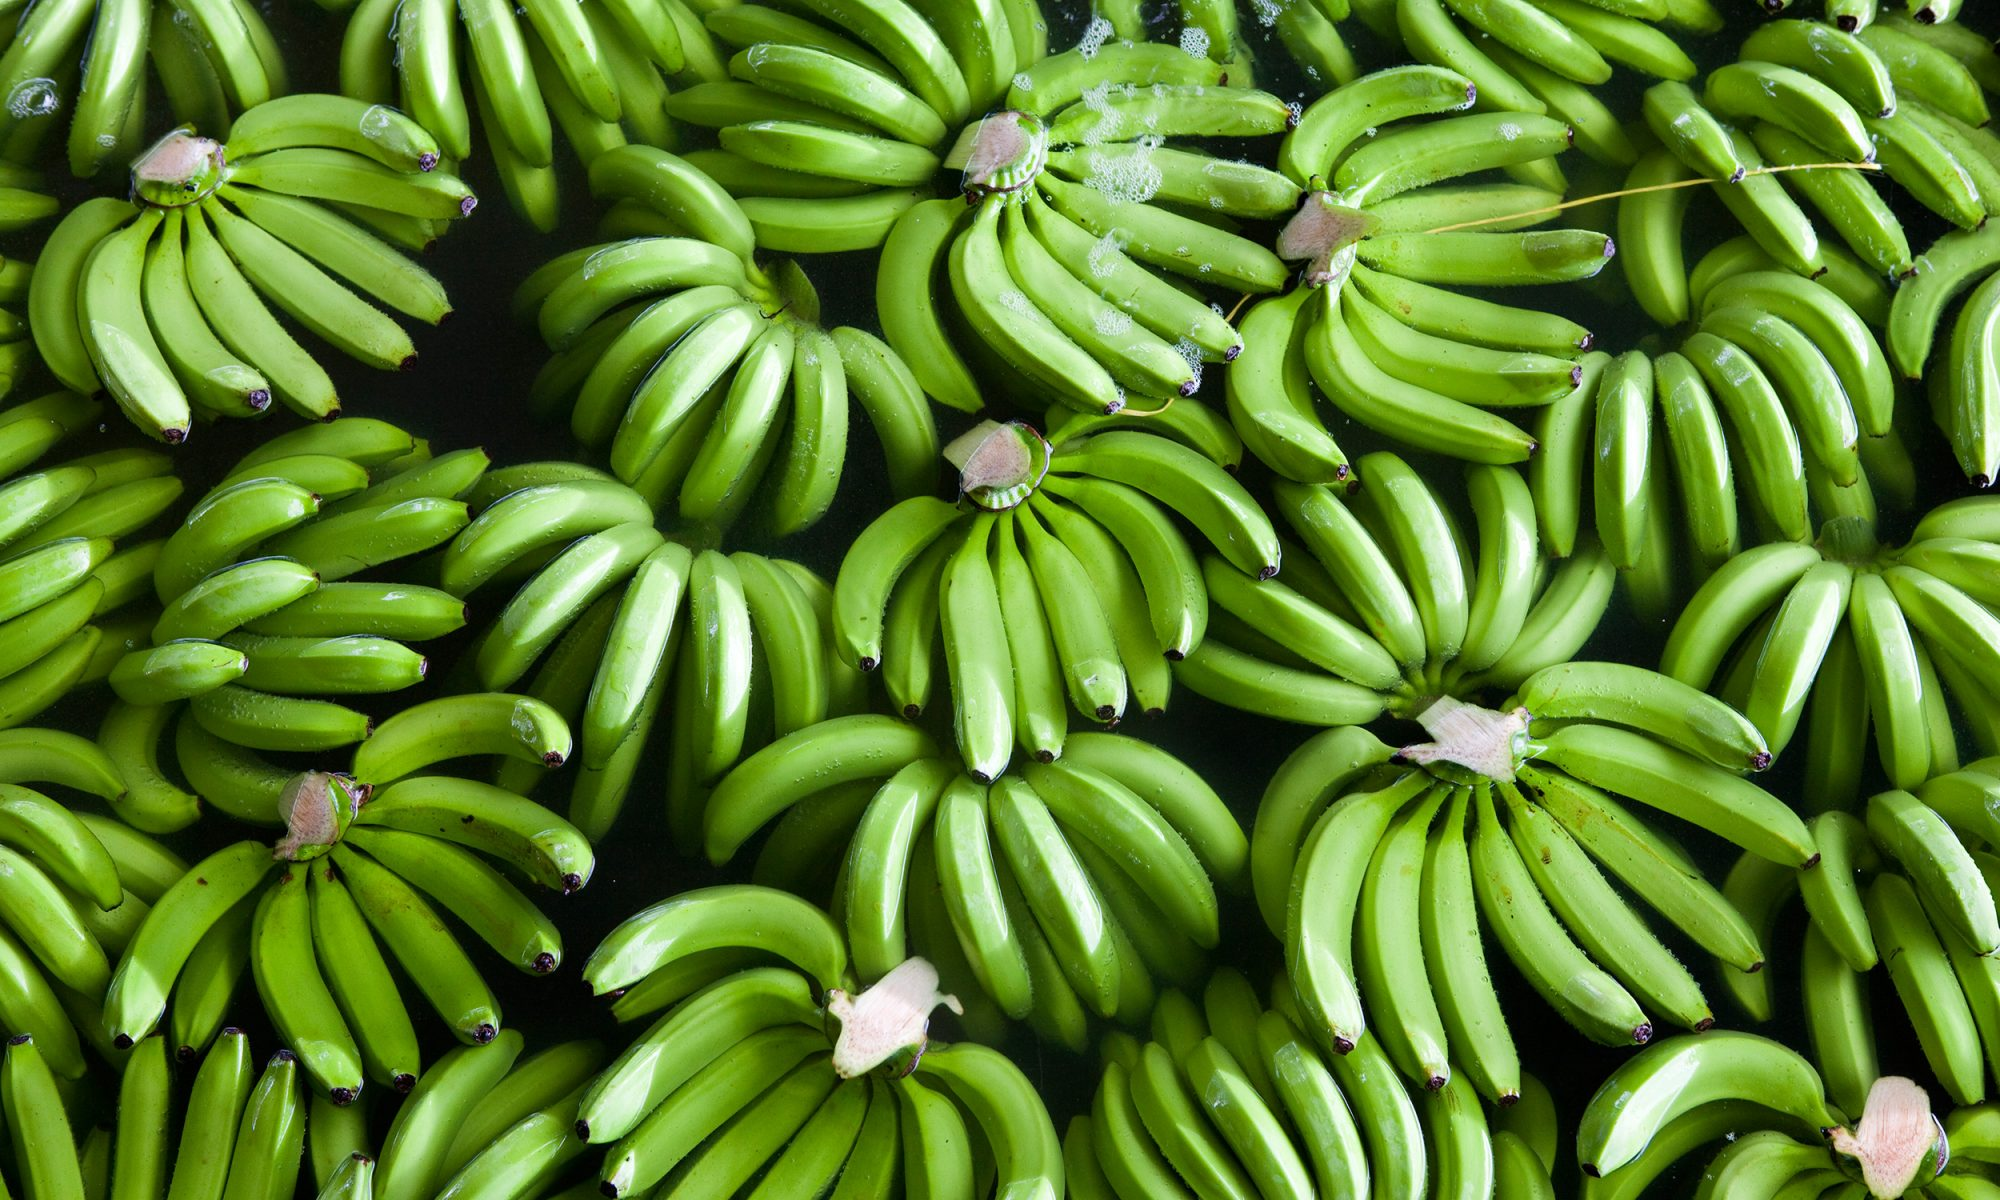 EC: What Is Green Banana Flour?